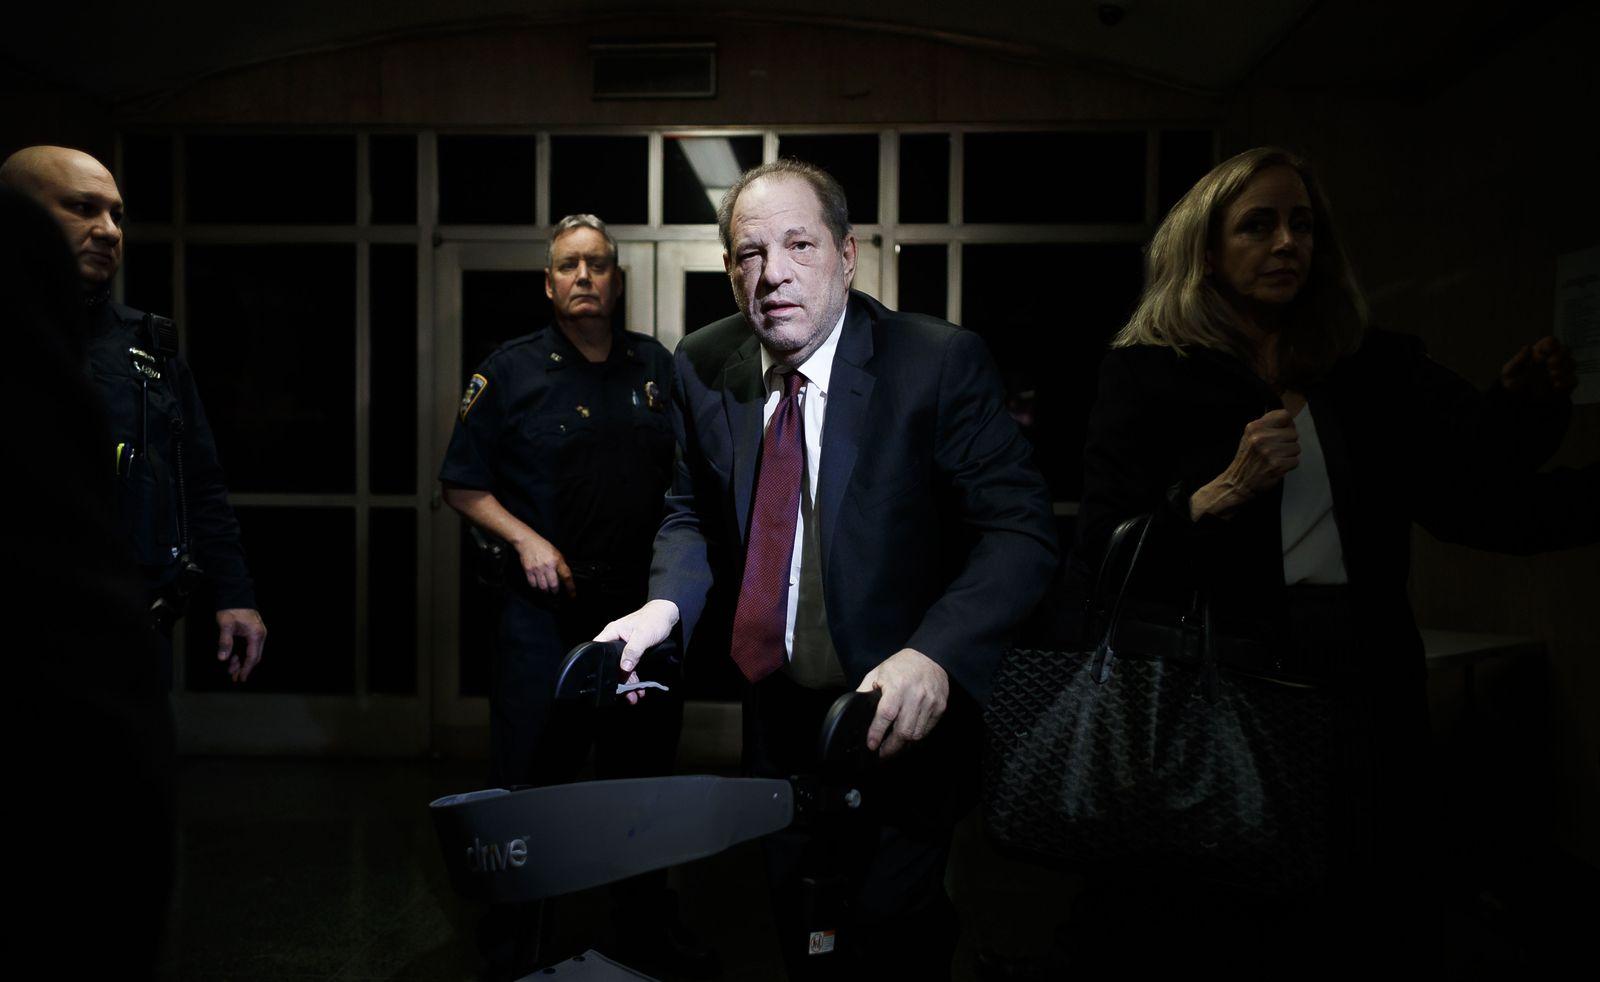 Harvey Weinstein Trial in Jury Deliberations in New York, USA - 20 Feb 2020